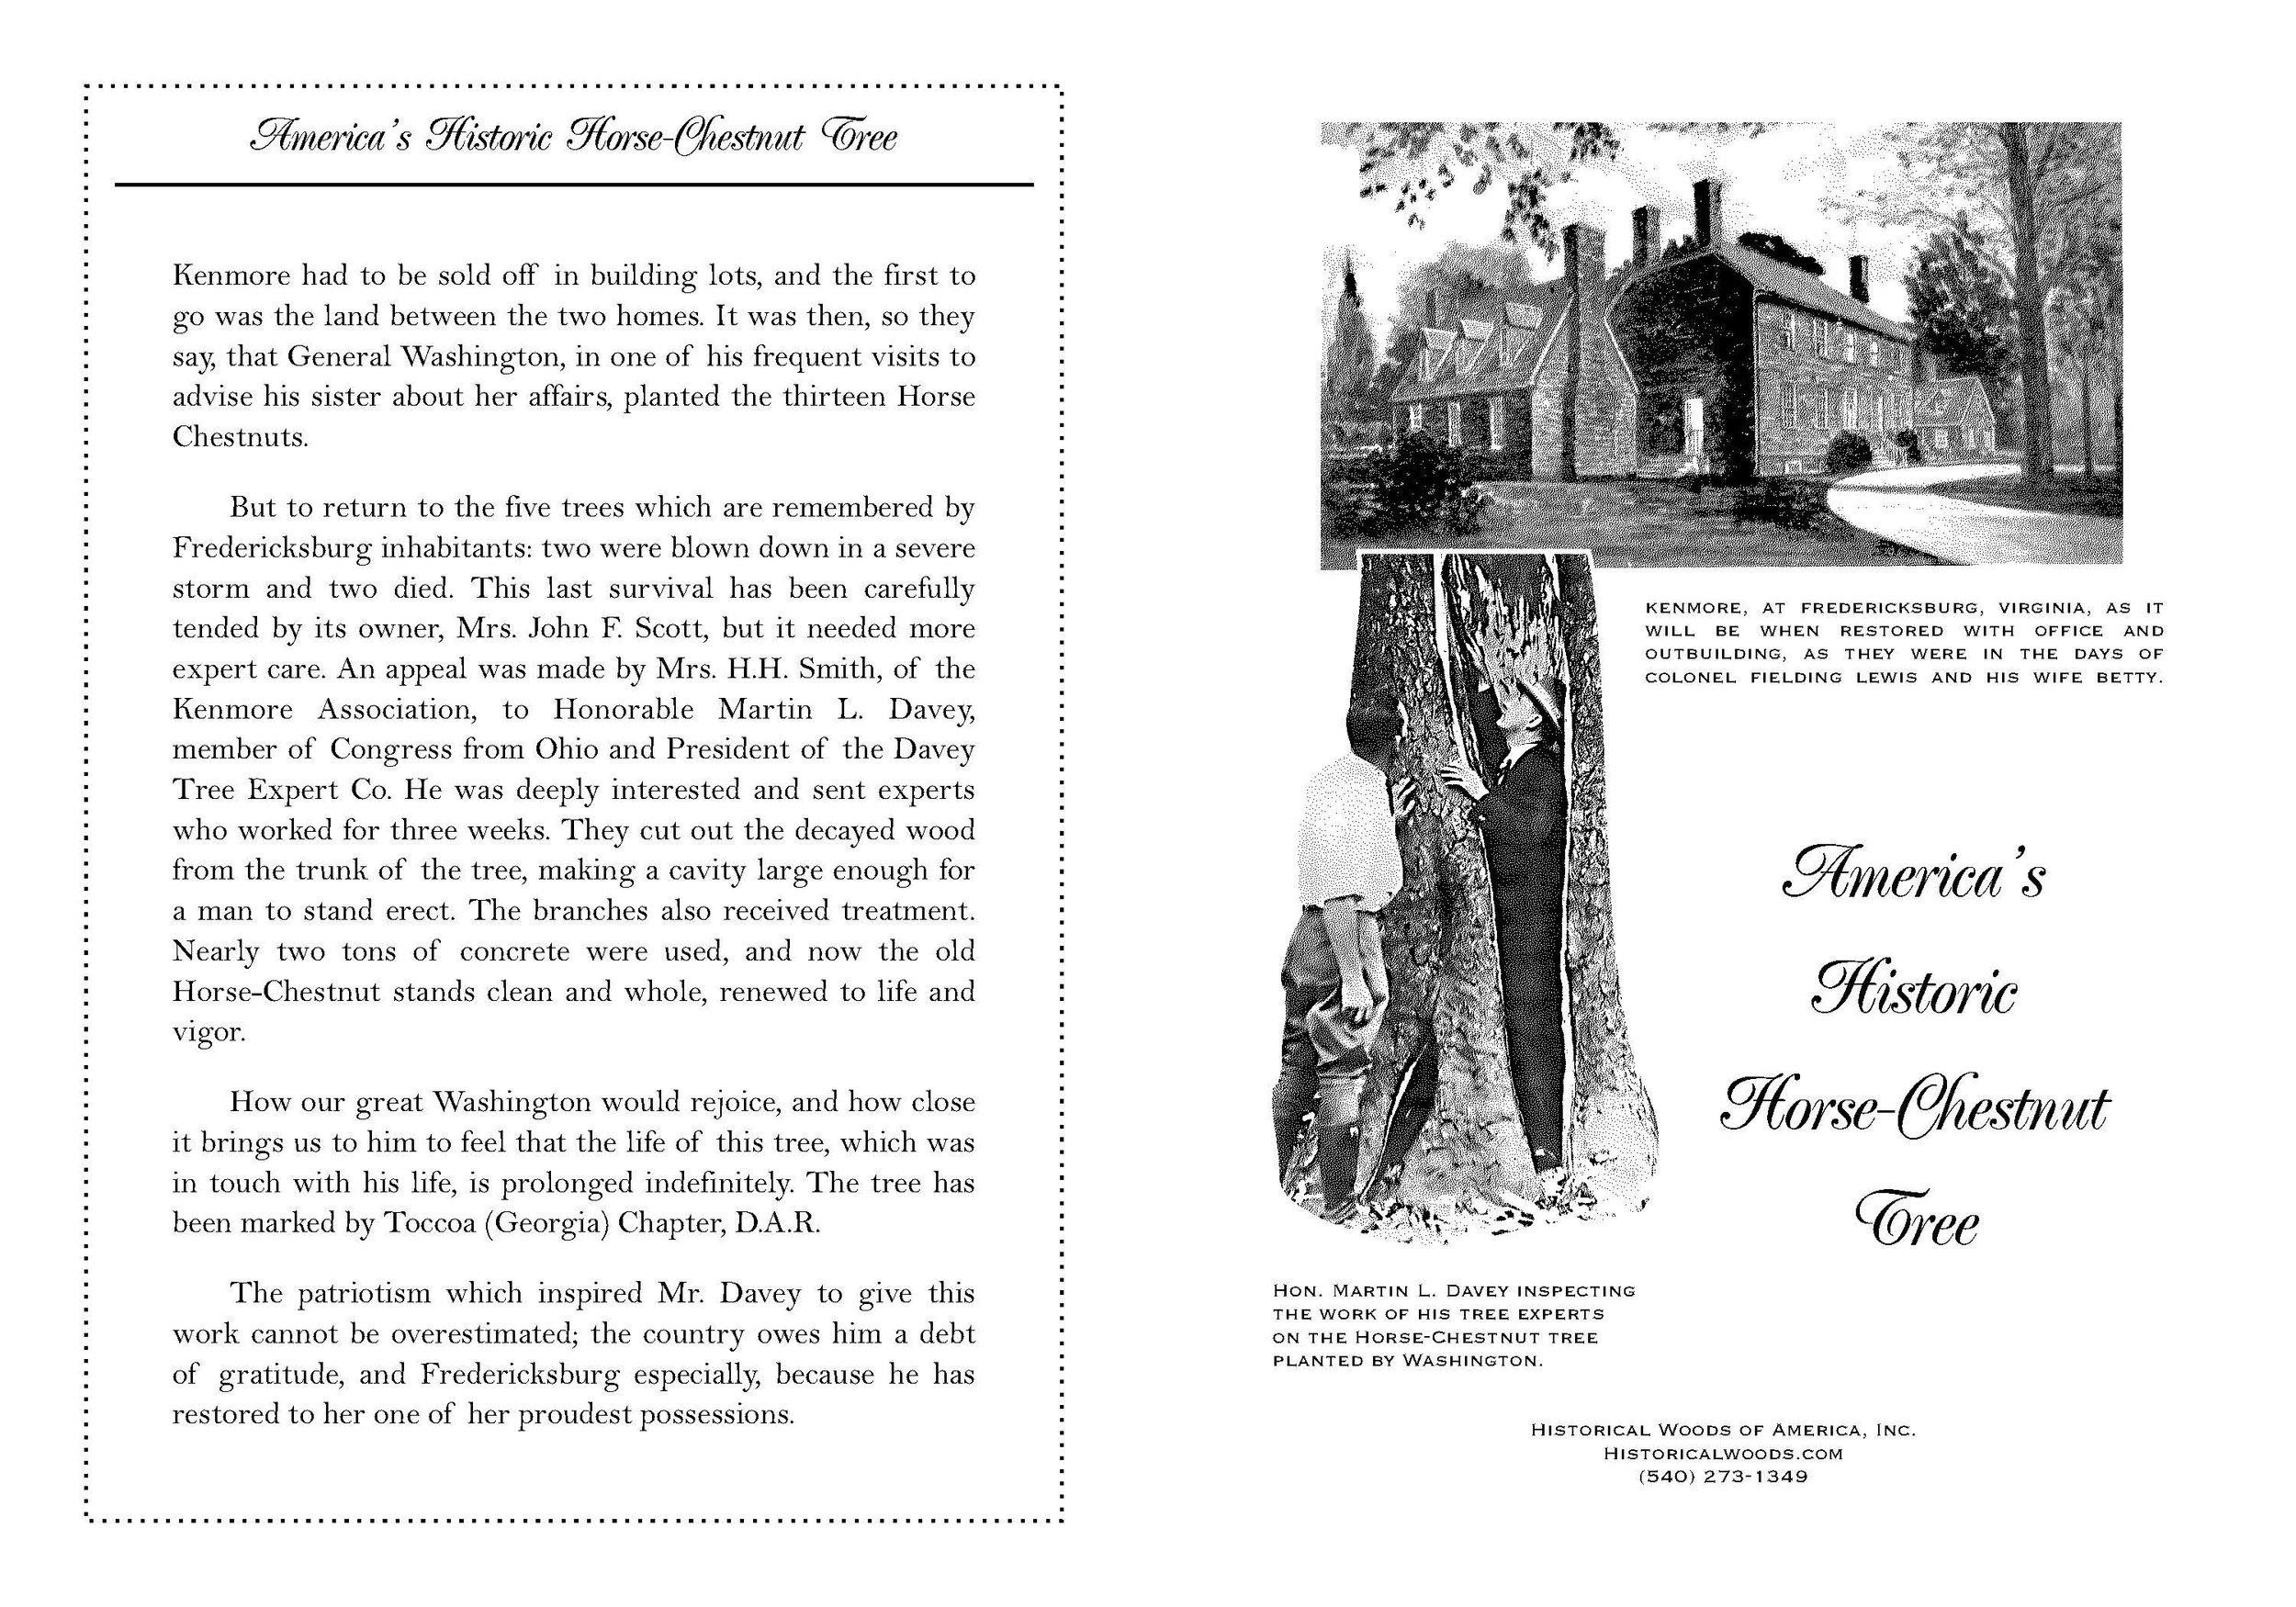 HorseChestnutTree+pdf_Page_1.jpg